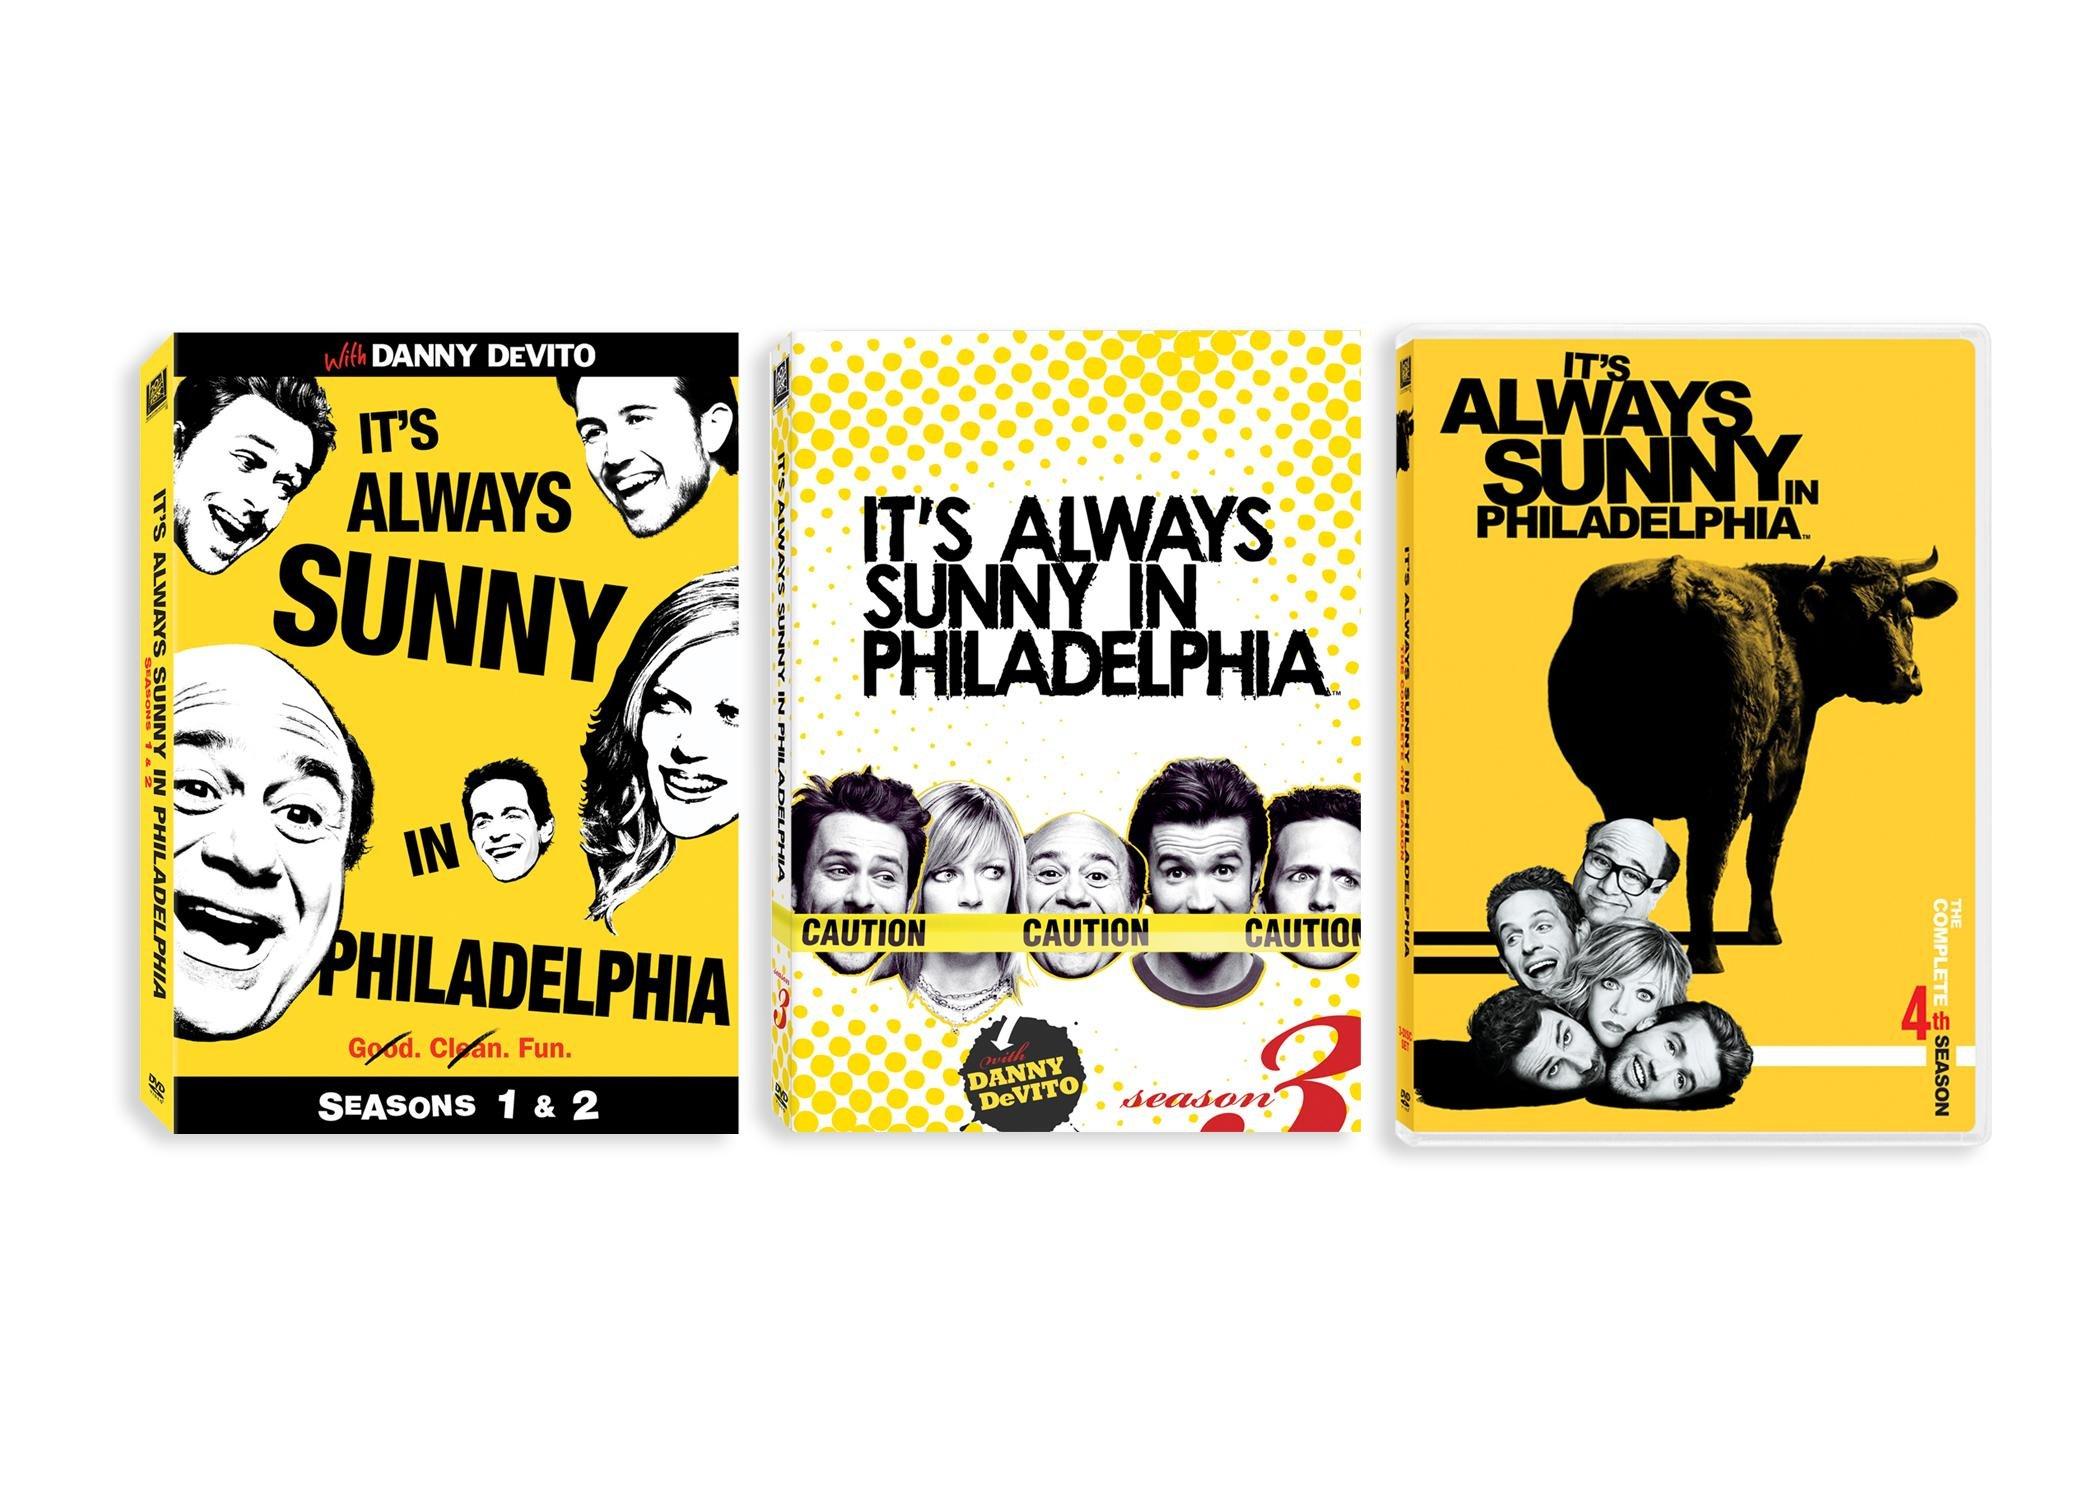 It's Always Sunny in Philadelphia: Seasons 1-4